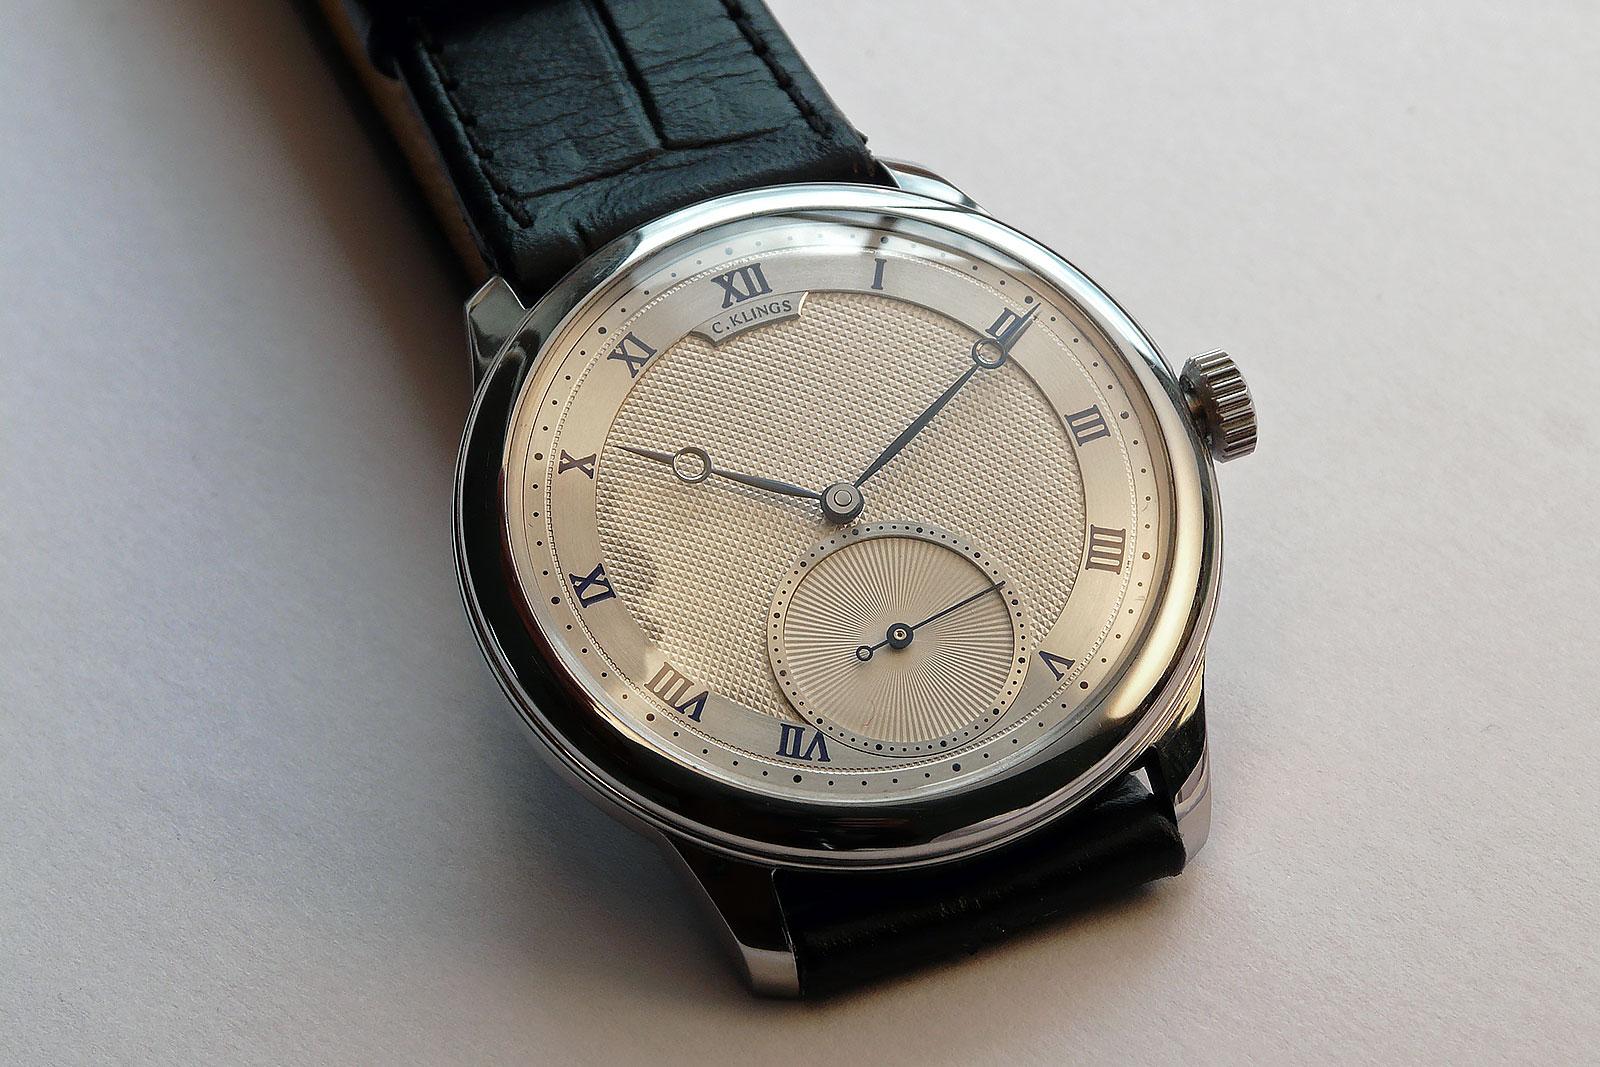 Christian Klings Visibility wristwatch no 5 7